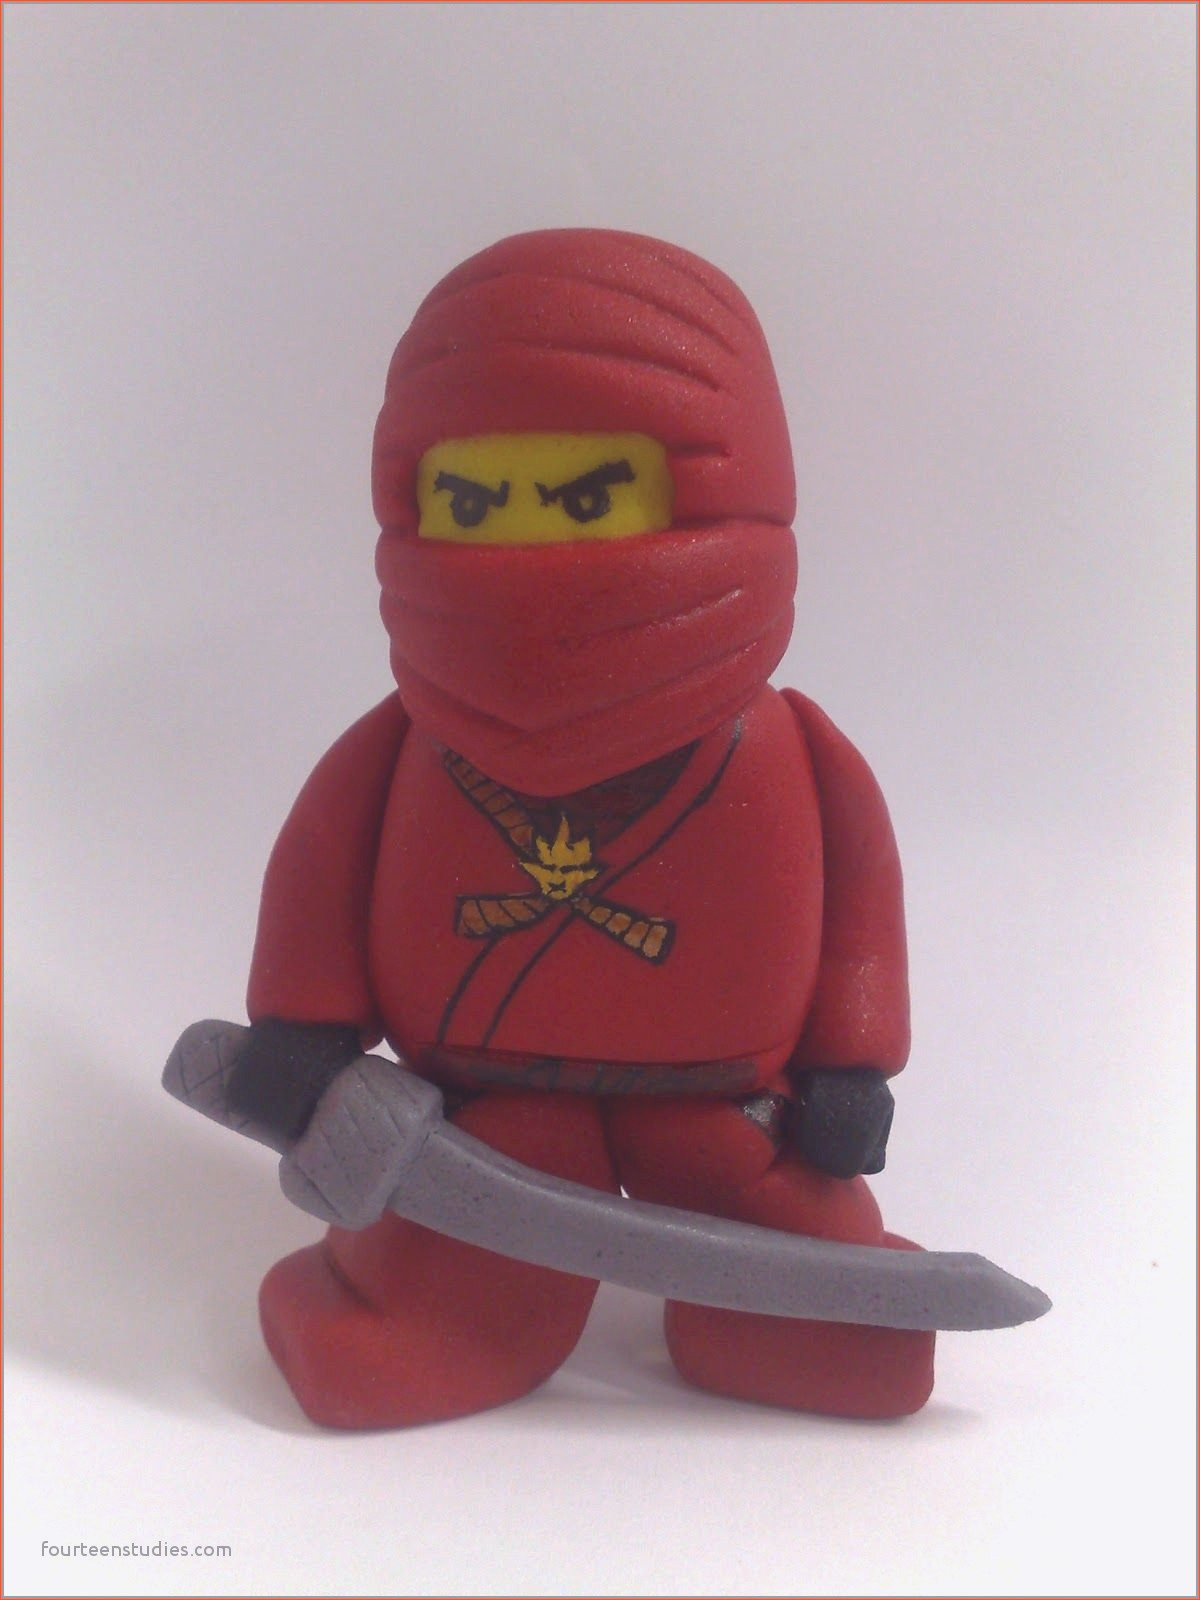 Lego Ninjago Ausmalbilder Inspirierend Ausmalbilder Ninjago Anacondrai Bilder